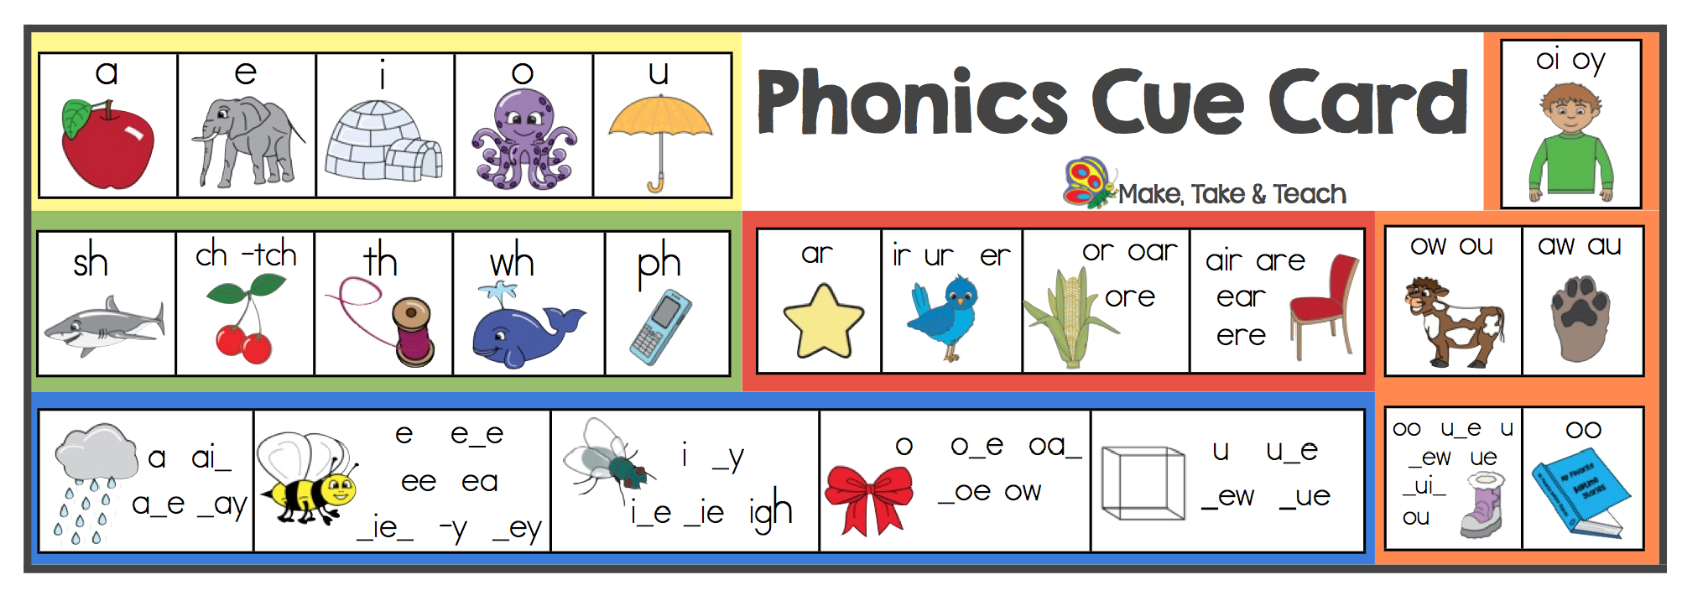 Free Phonics Cue Card - Make Take & Teach - Free Phonics Readers Printable